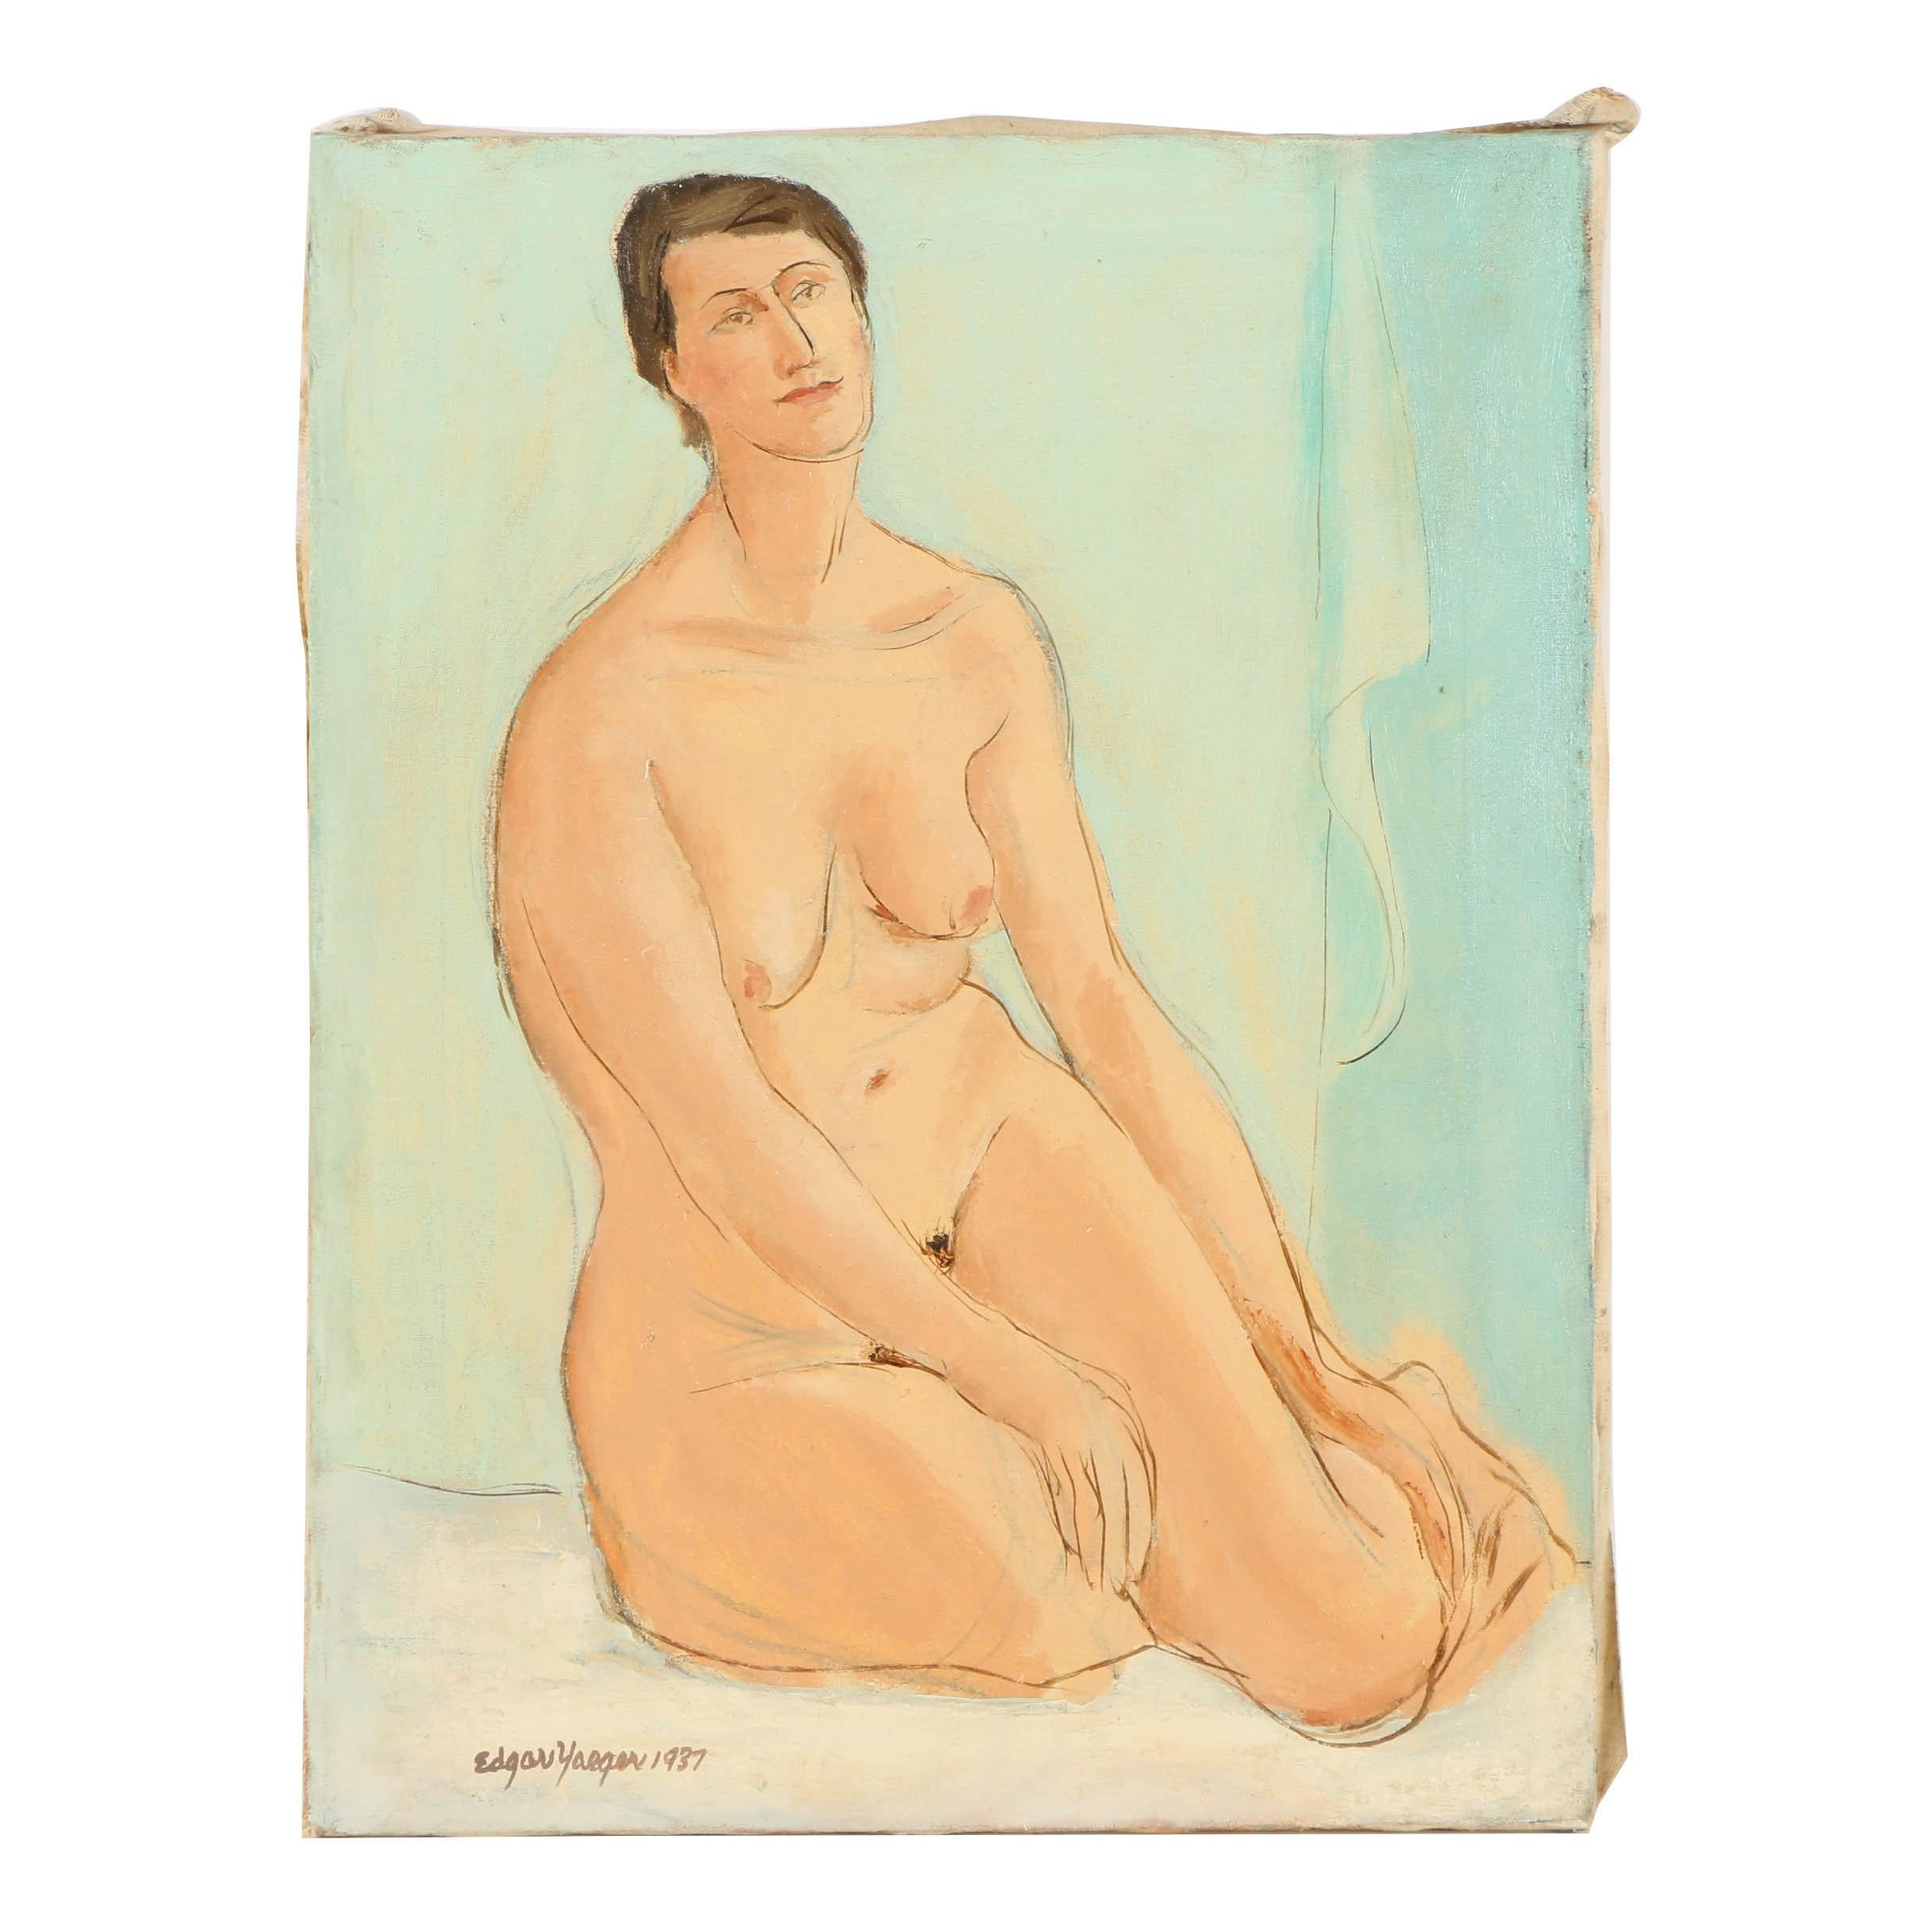 Edgar Yaeger Oil Painting on Canvas Portrait of Female Nude